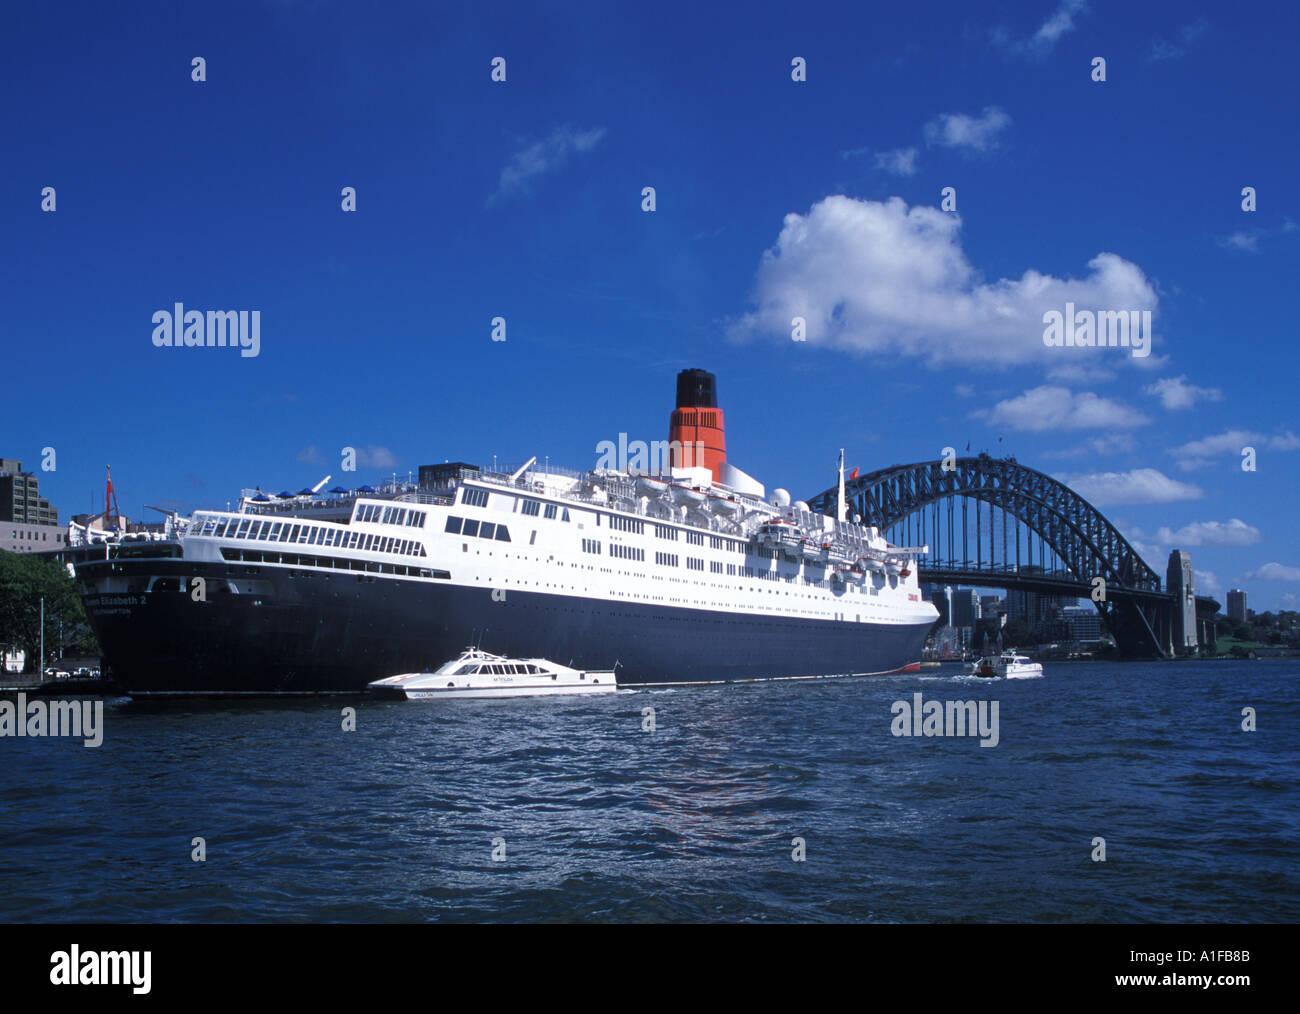 QE2 and Sydney Harbor Bridge in Australia - Stock Image